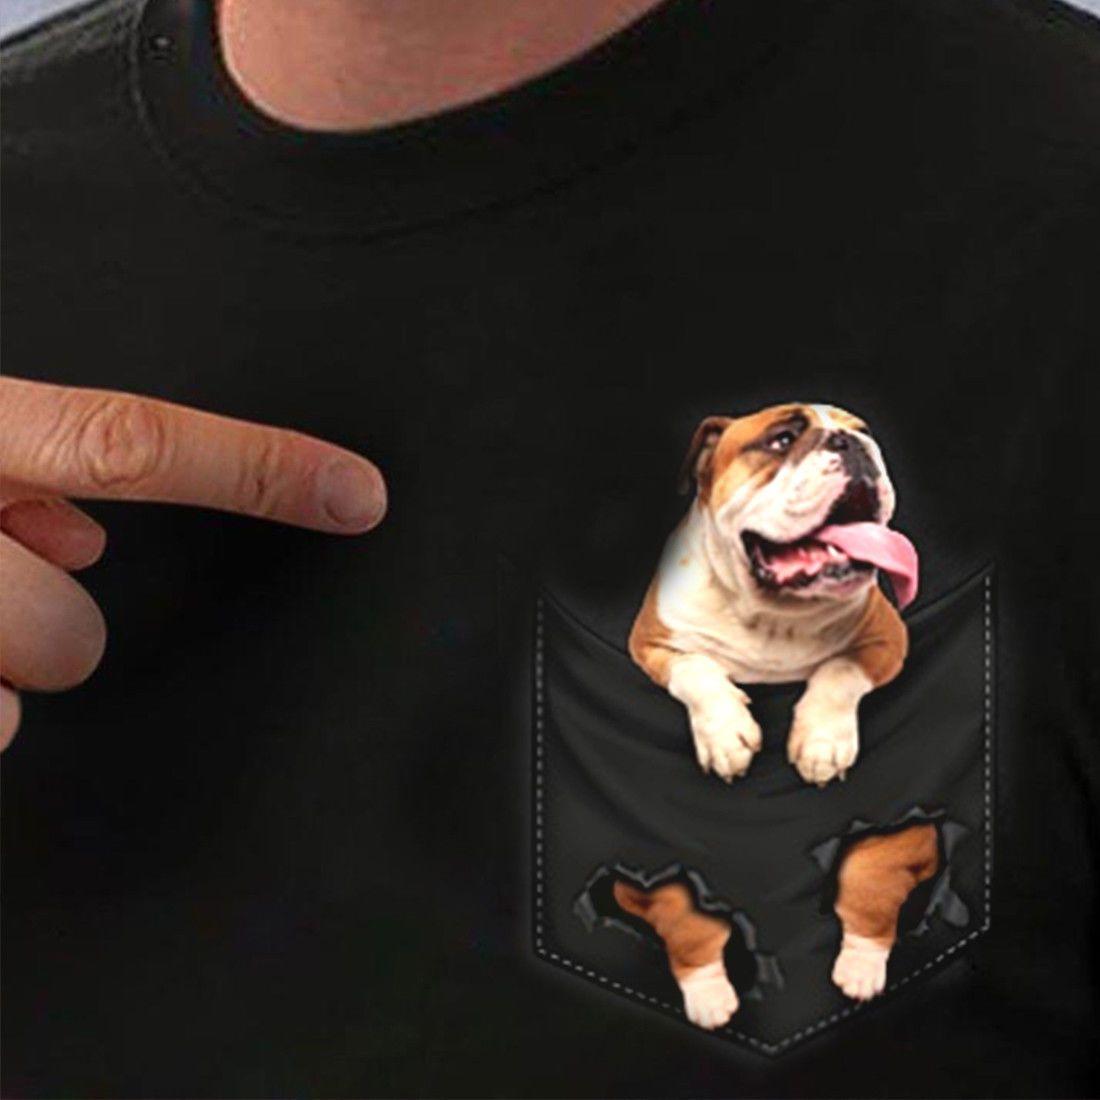 English Bulldog Inside Pocket T Shirt Dog Lovers Black Cotton Men S-6XL  mens pride dark t-shirt fan pants t shirt